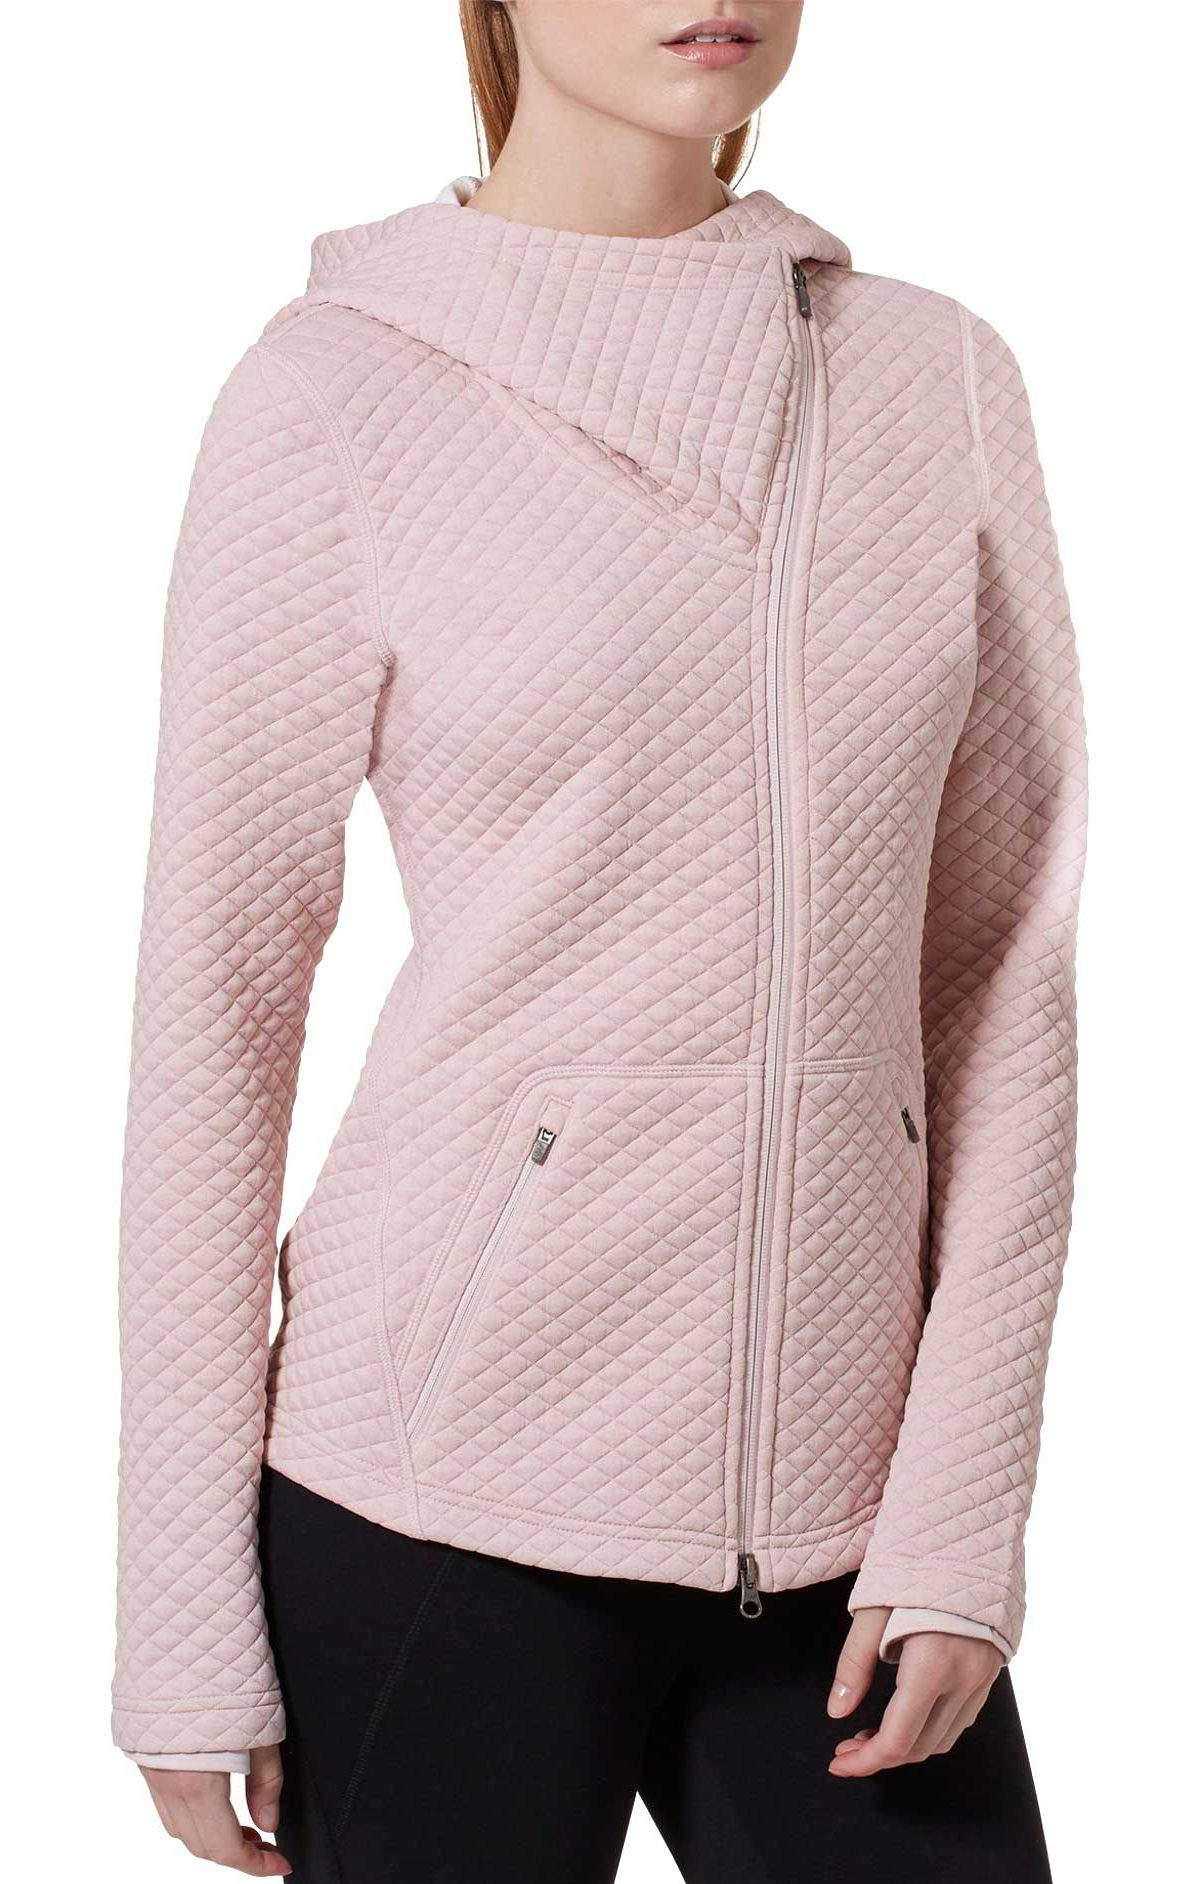 New Balance Women's Heat Loft Asymmetrical Full-Zip Jacket (XS, Pink)